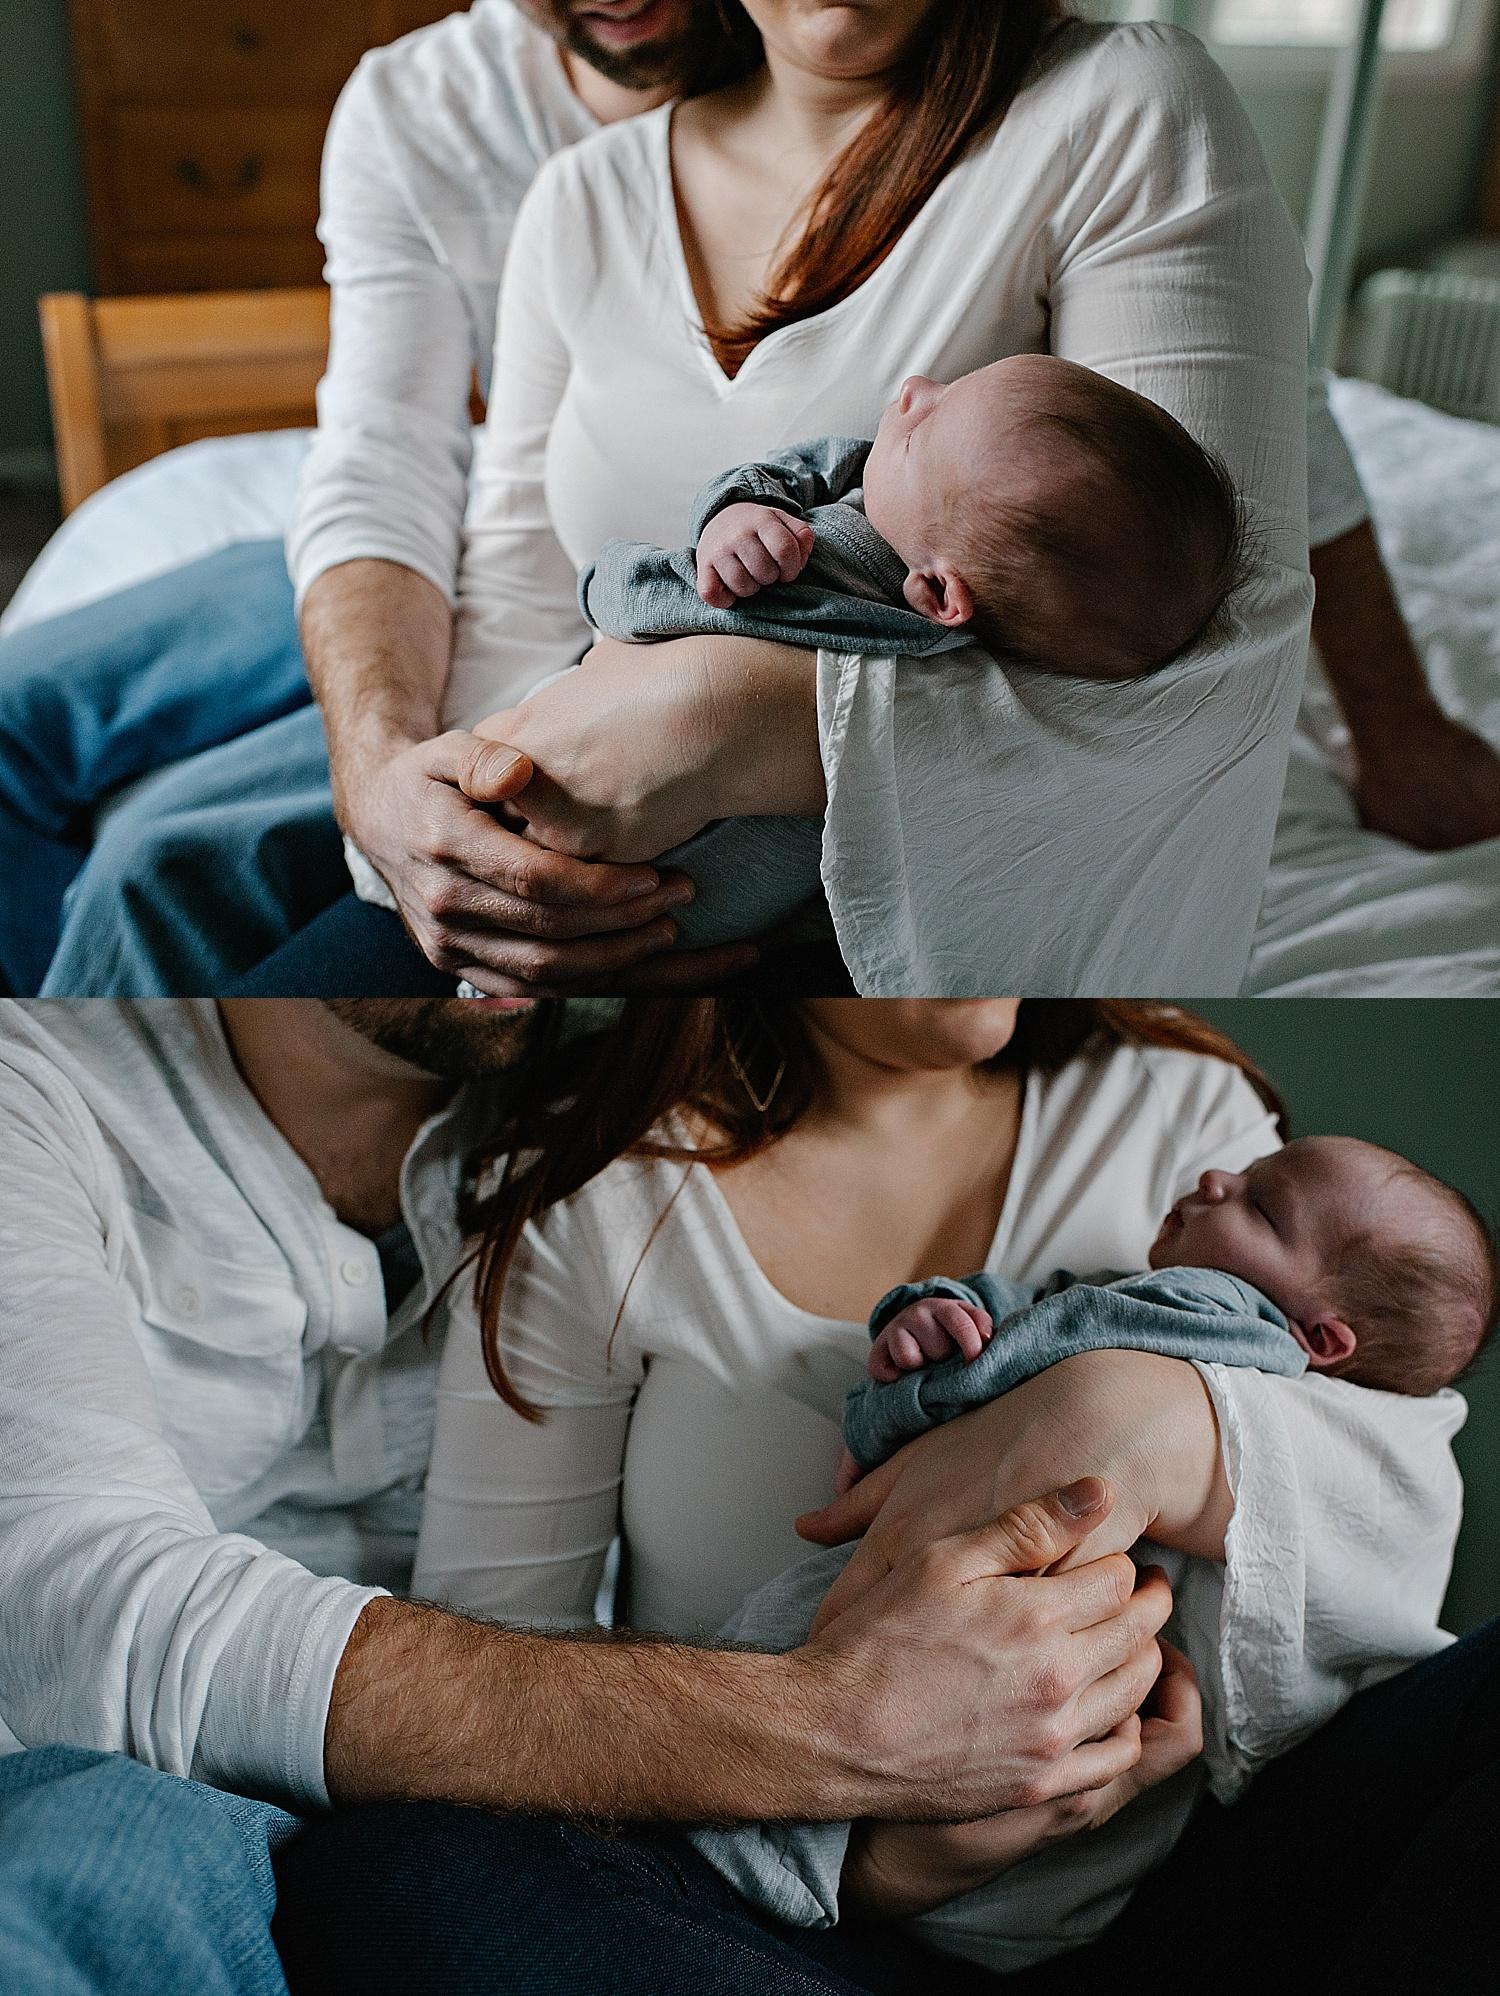 lauren_grayson_akron_canton_cleveland_ohio_photographer_maternity_newborn_family_0037.jpg